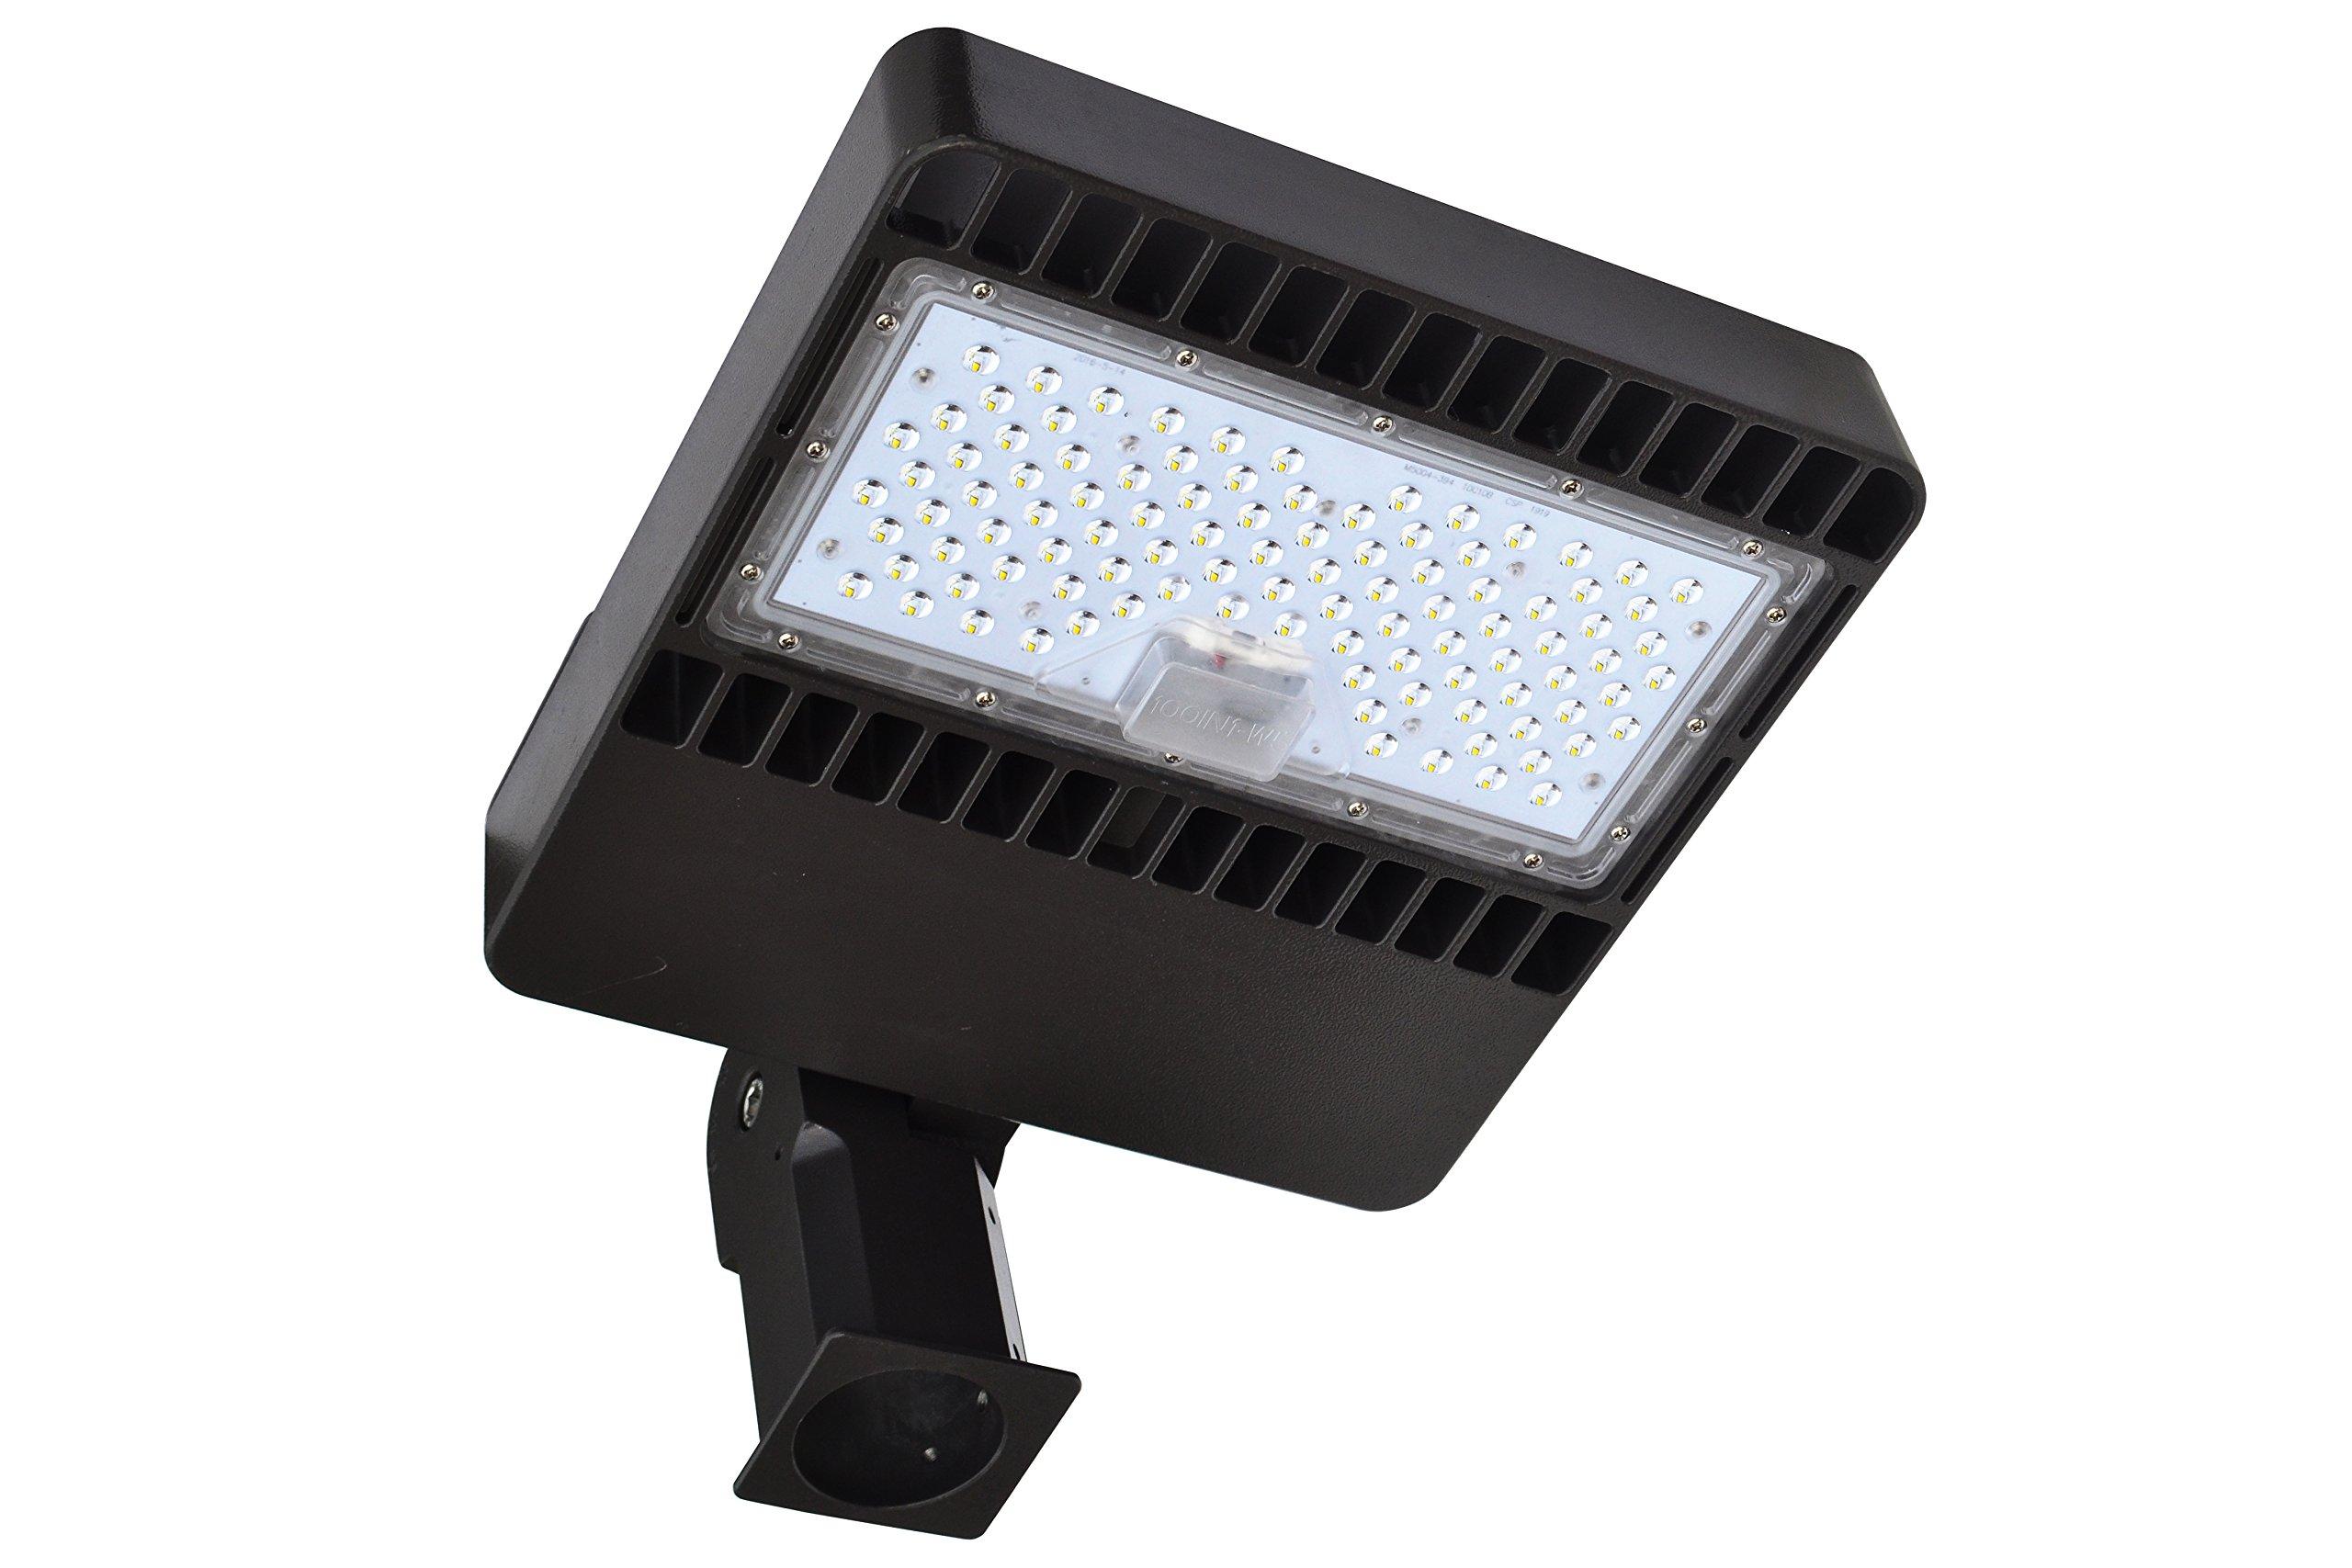 150watt LED Parking Lot Lights with Photocell Street Light Dusk to Dawn Outdoor Lighting with Light Sensor Shoebox Pole Lights 5000K Super Bright 16500LM DLC ETL Listed